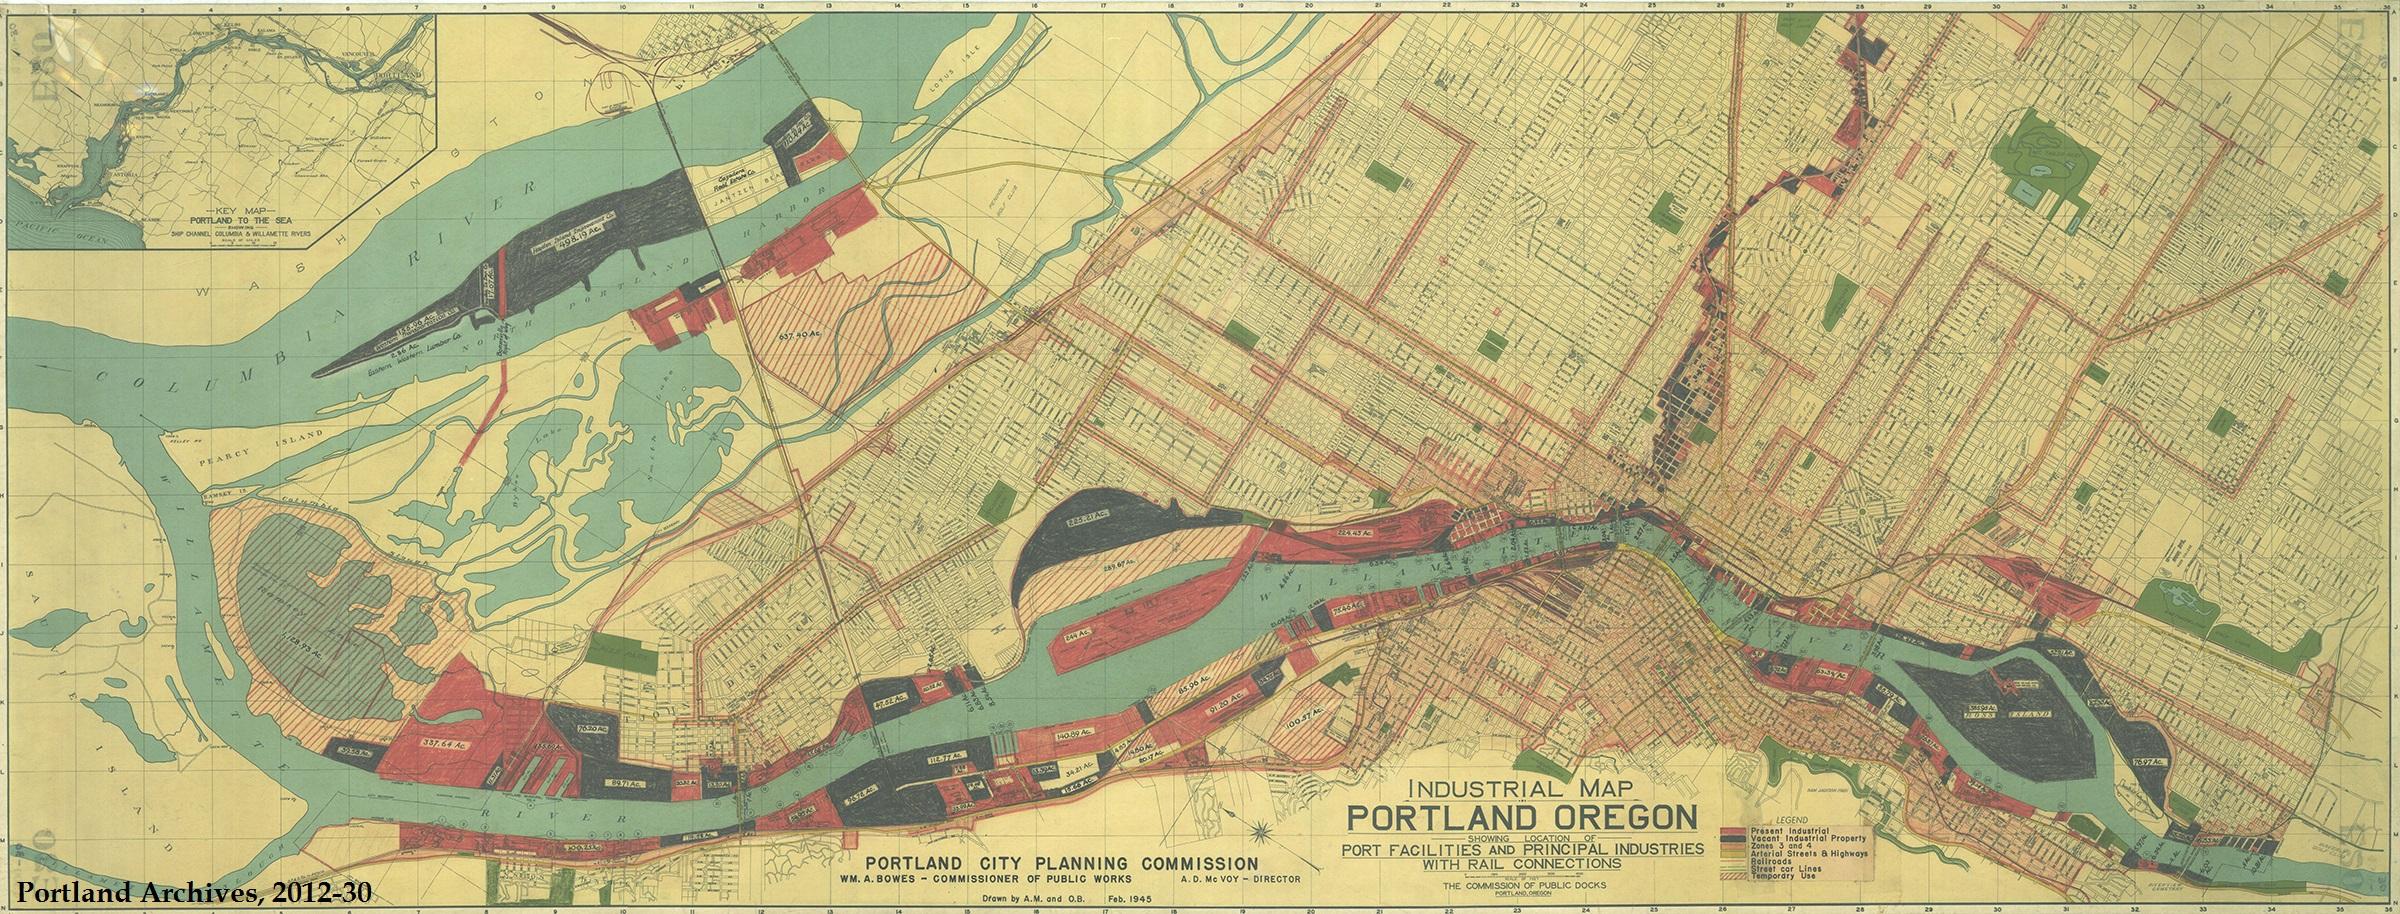 Portland Industrial Map, 1945 | Vintage Portland